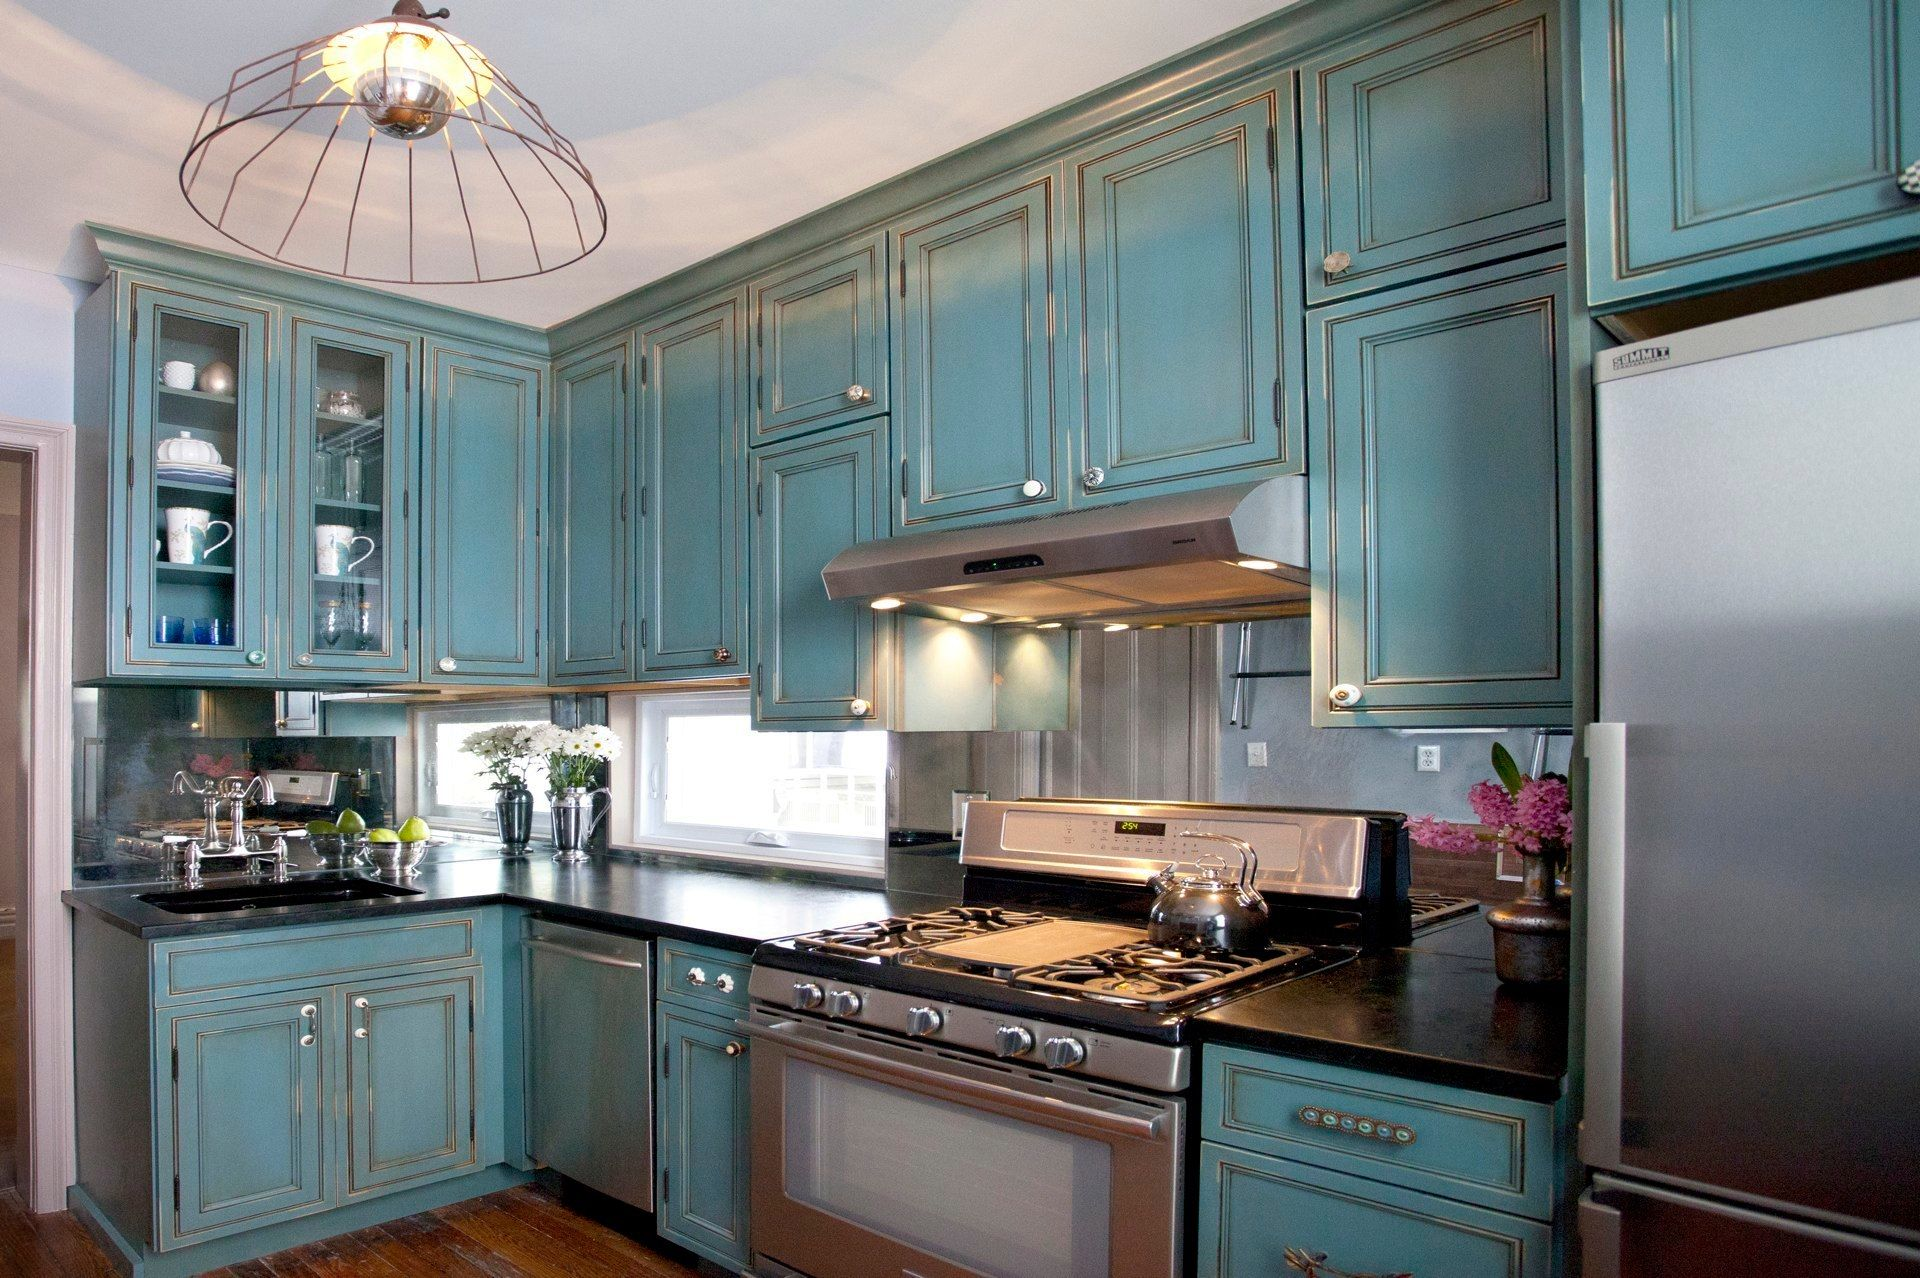 Pin By The Cousins On Kitchen Cousins Season 2 Distressed Kitchen Cabinets Teal Kitchen Cabinets Turquoise Kitchen Cabinets